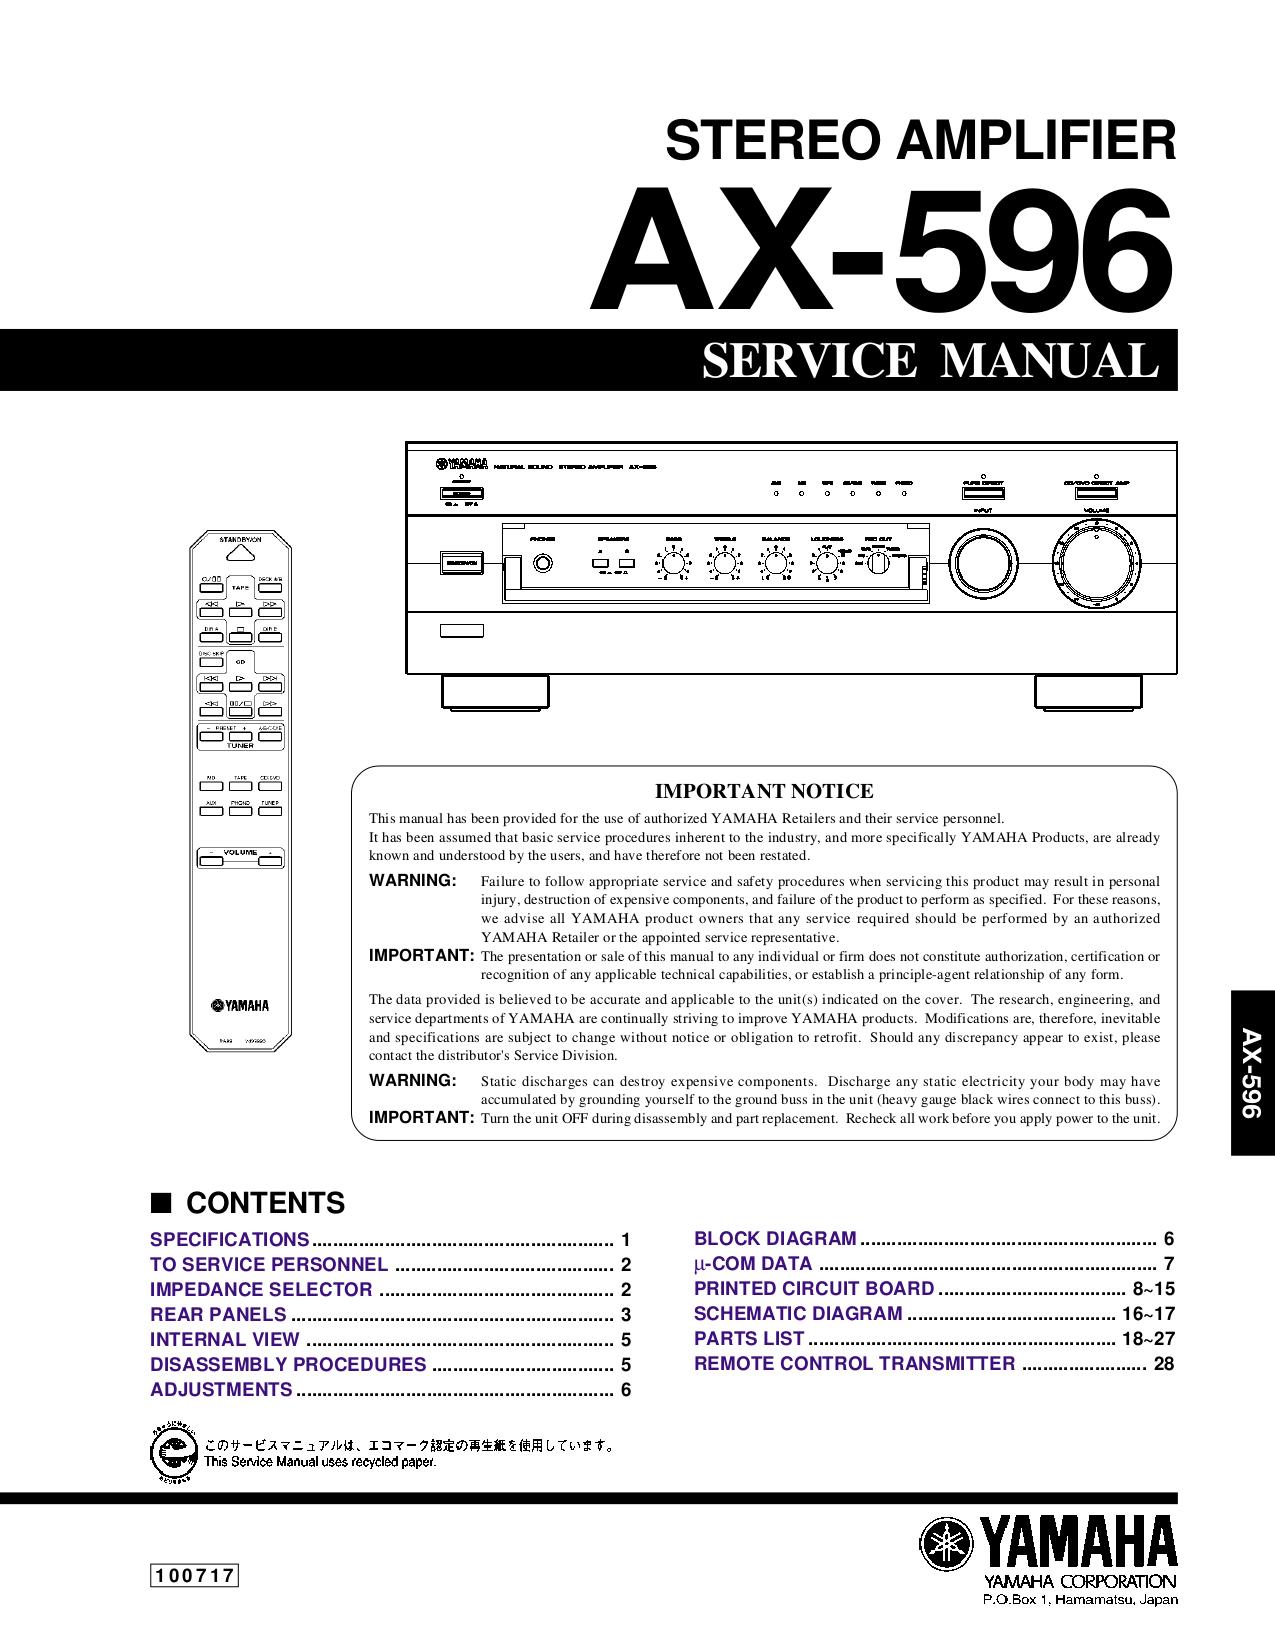 honda crv owners manual pdf